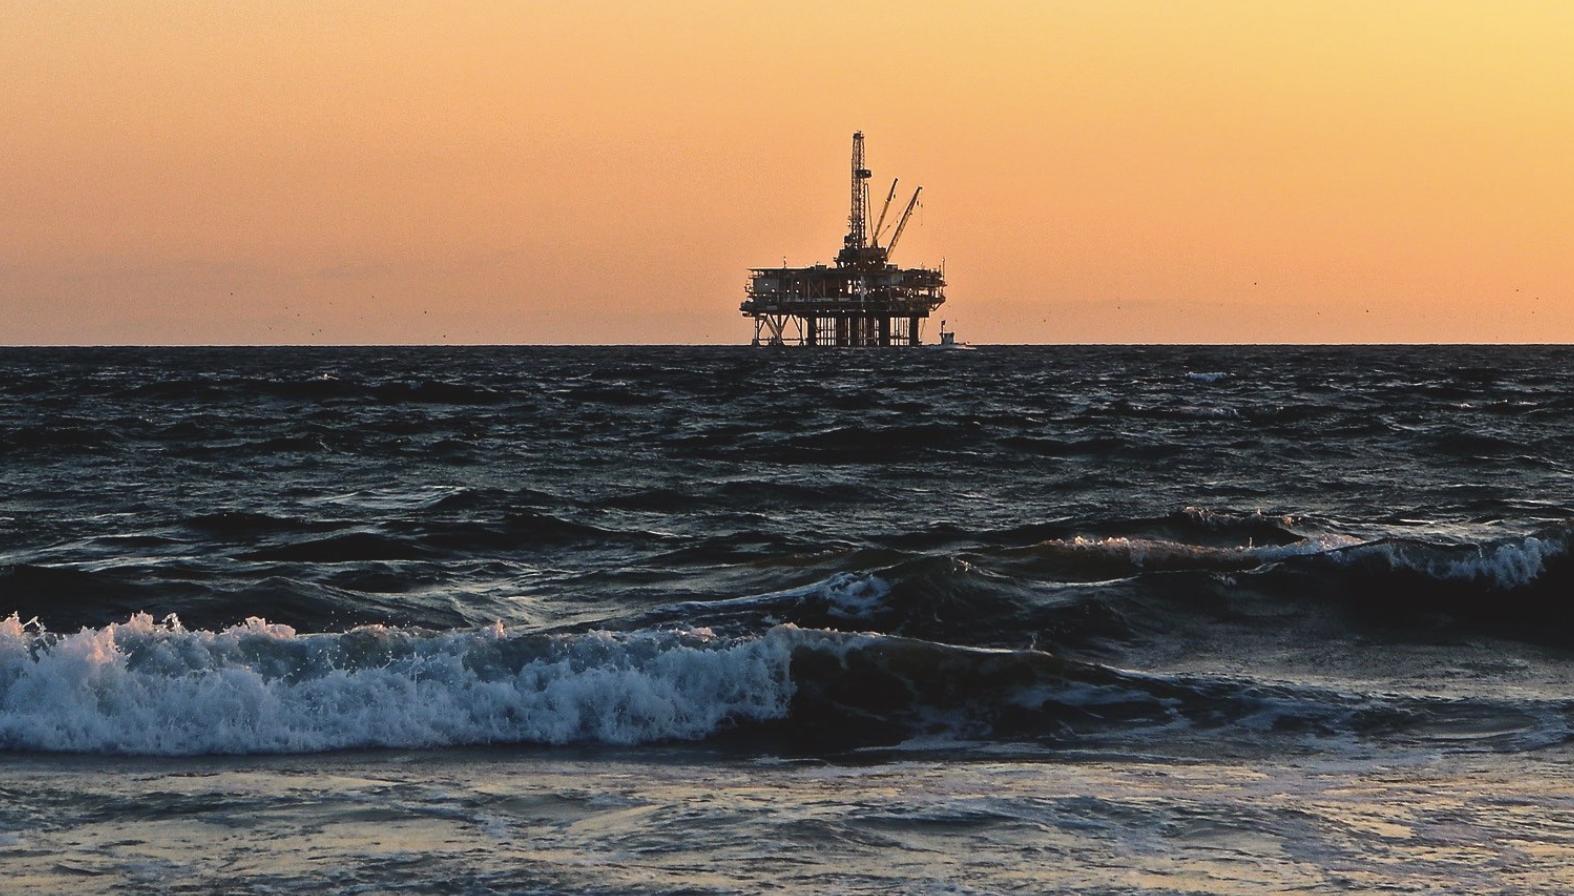 Oil Rig Waves